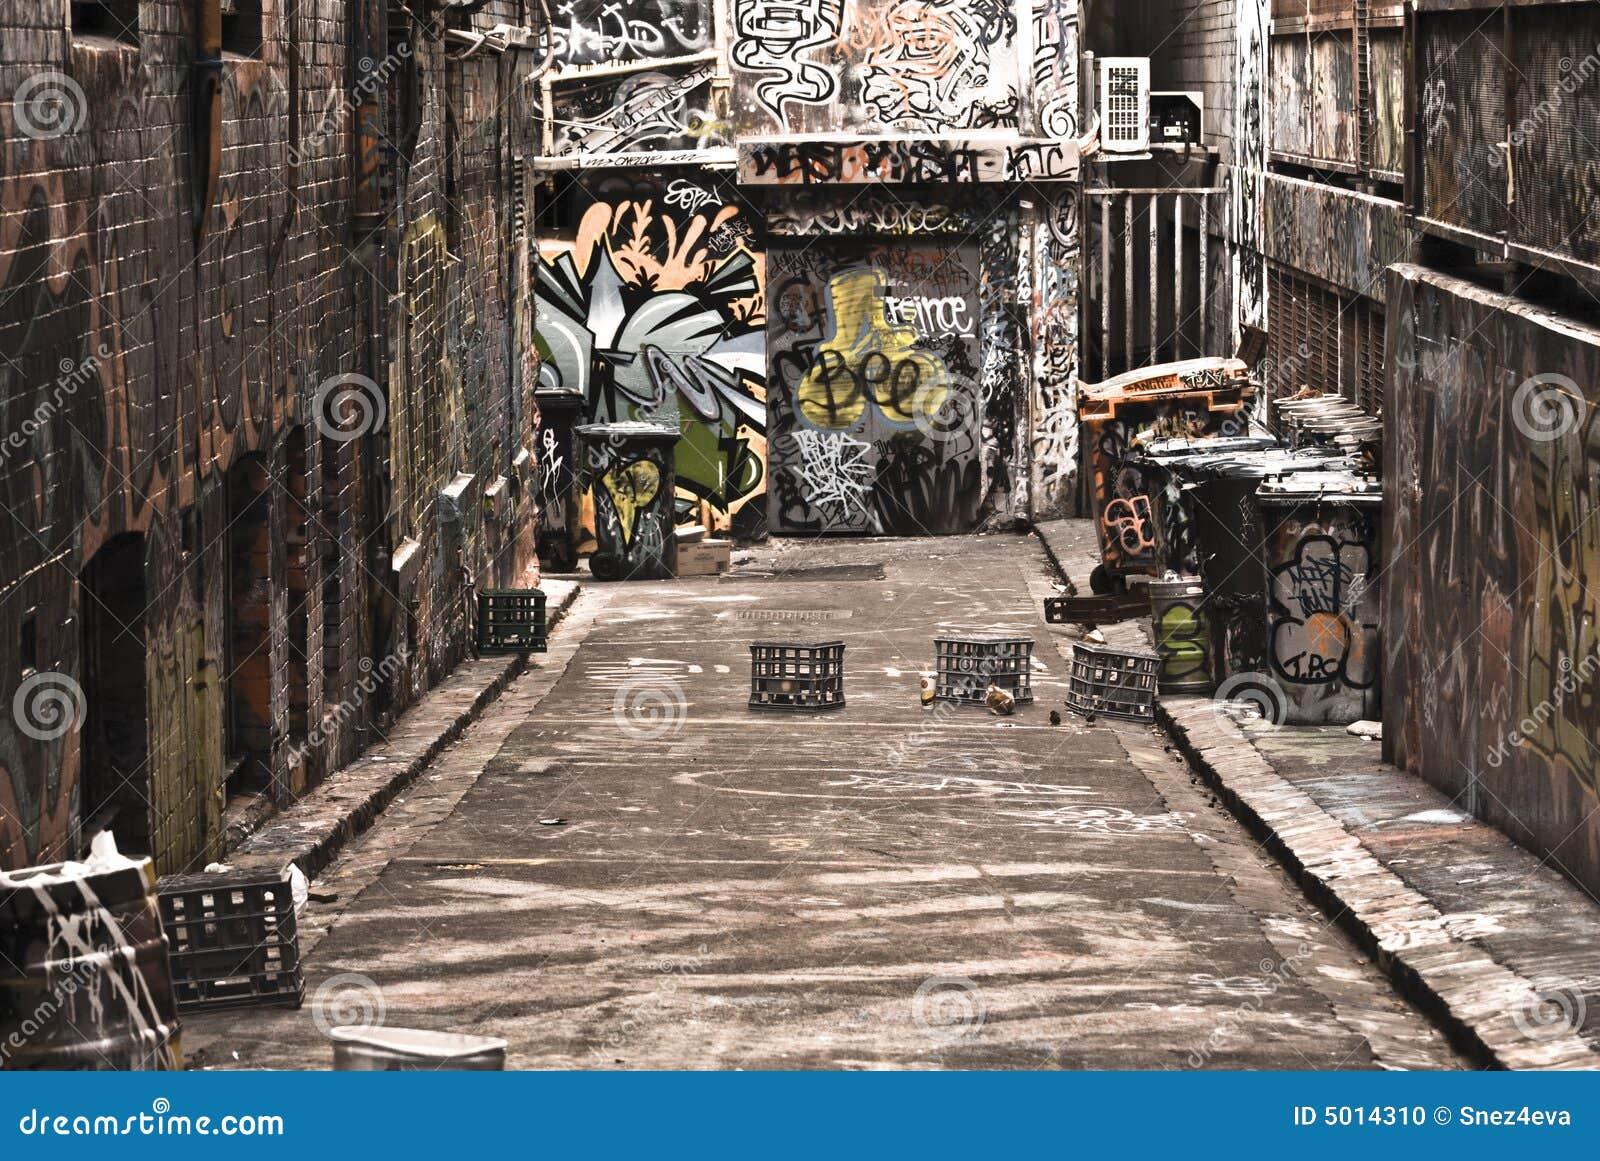 Urban Graffiti Stock Photo Image Of Grunge Spray Wall